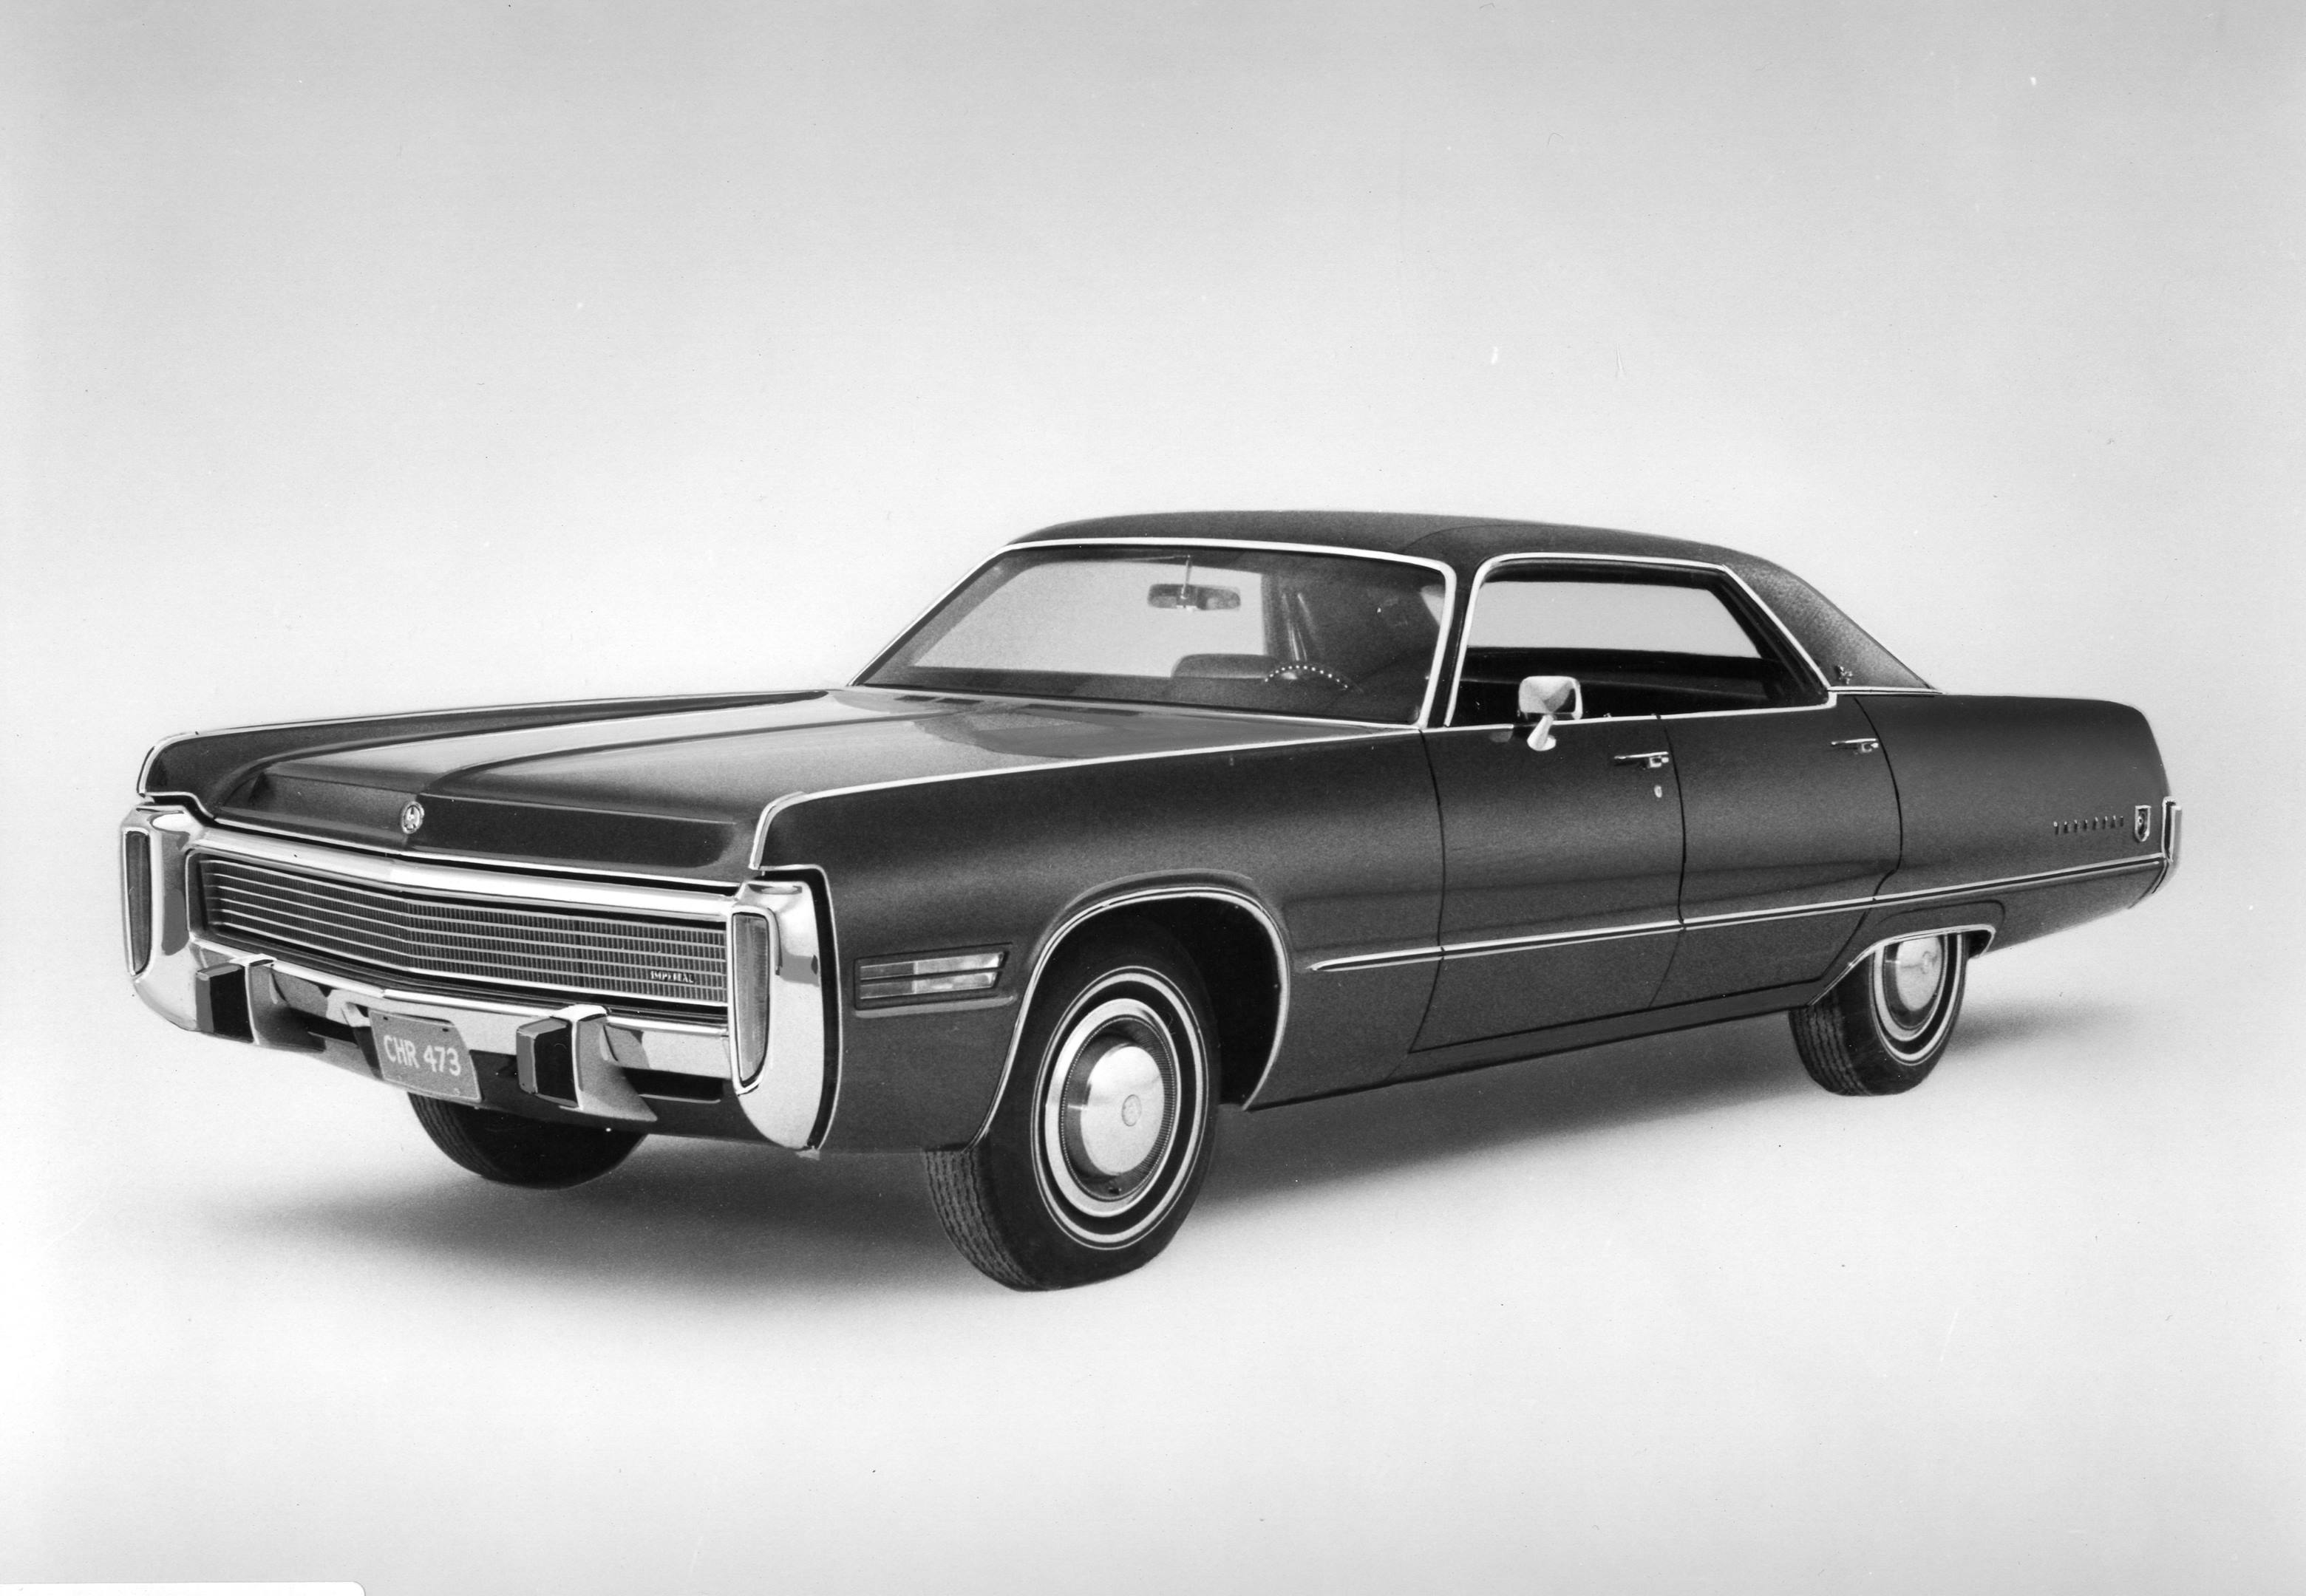 1972 Chrysler Imperial front 3/4